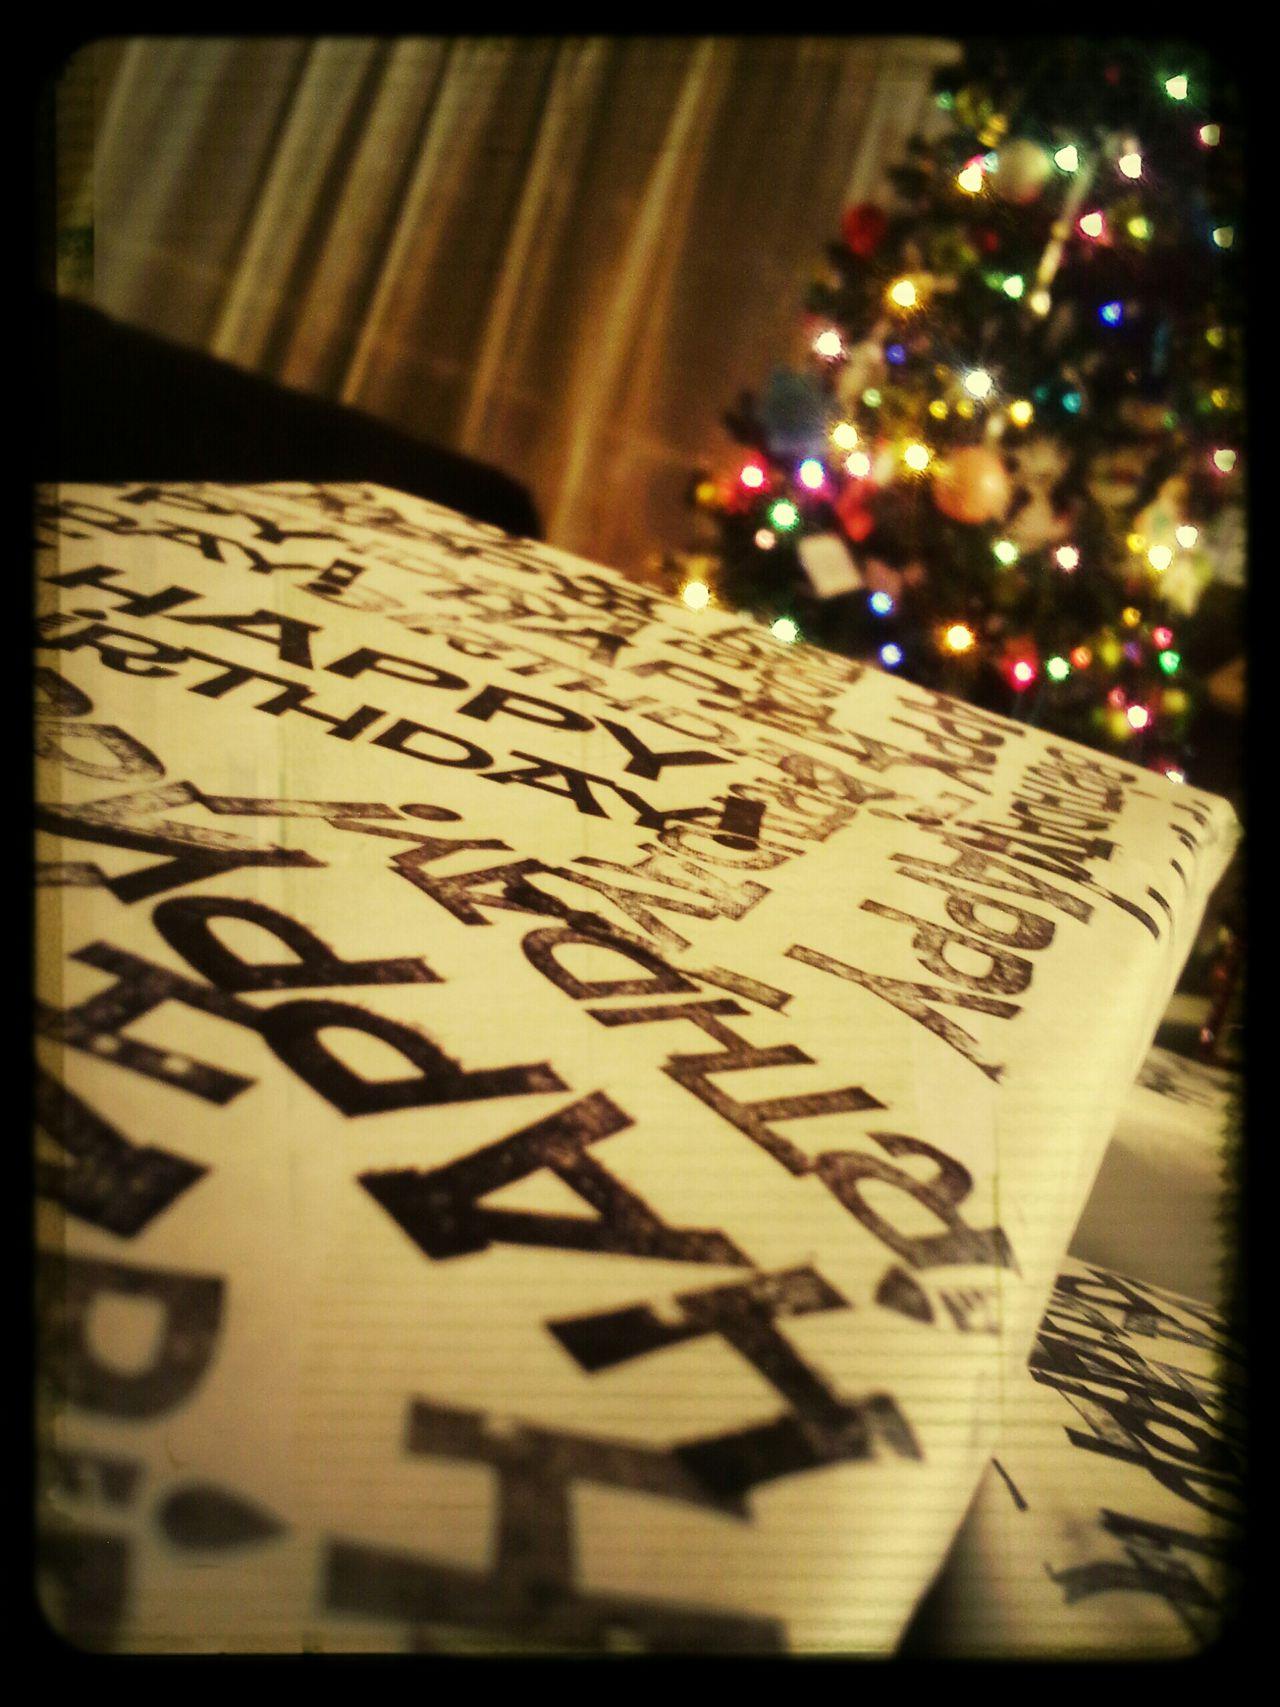 Birthday Present DIY Wrapping Paper Christmas Lights Christmas Tree